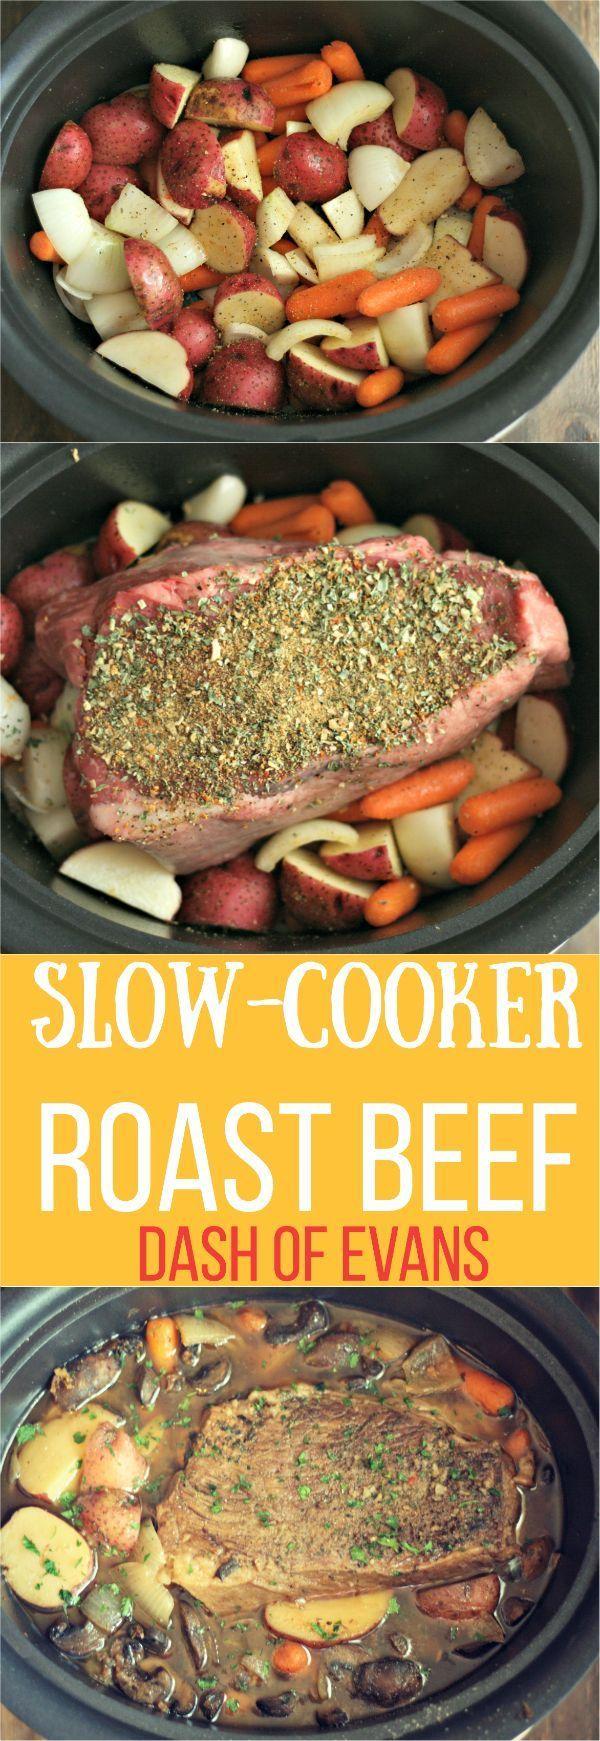 Looking for a simple, comfort food favorite? Try this Slow-Cooker Roast Beef using a Rump Roast. YUM! via /DashOfEvans/